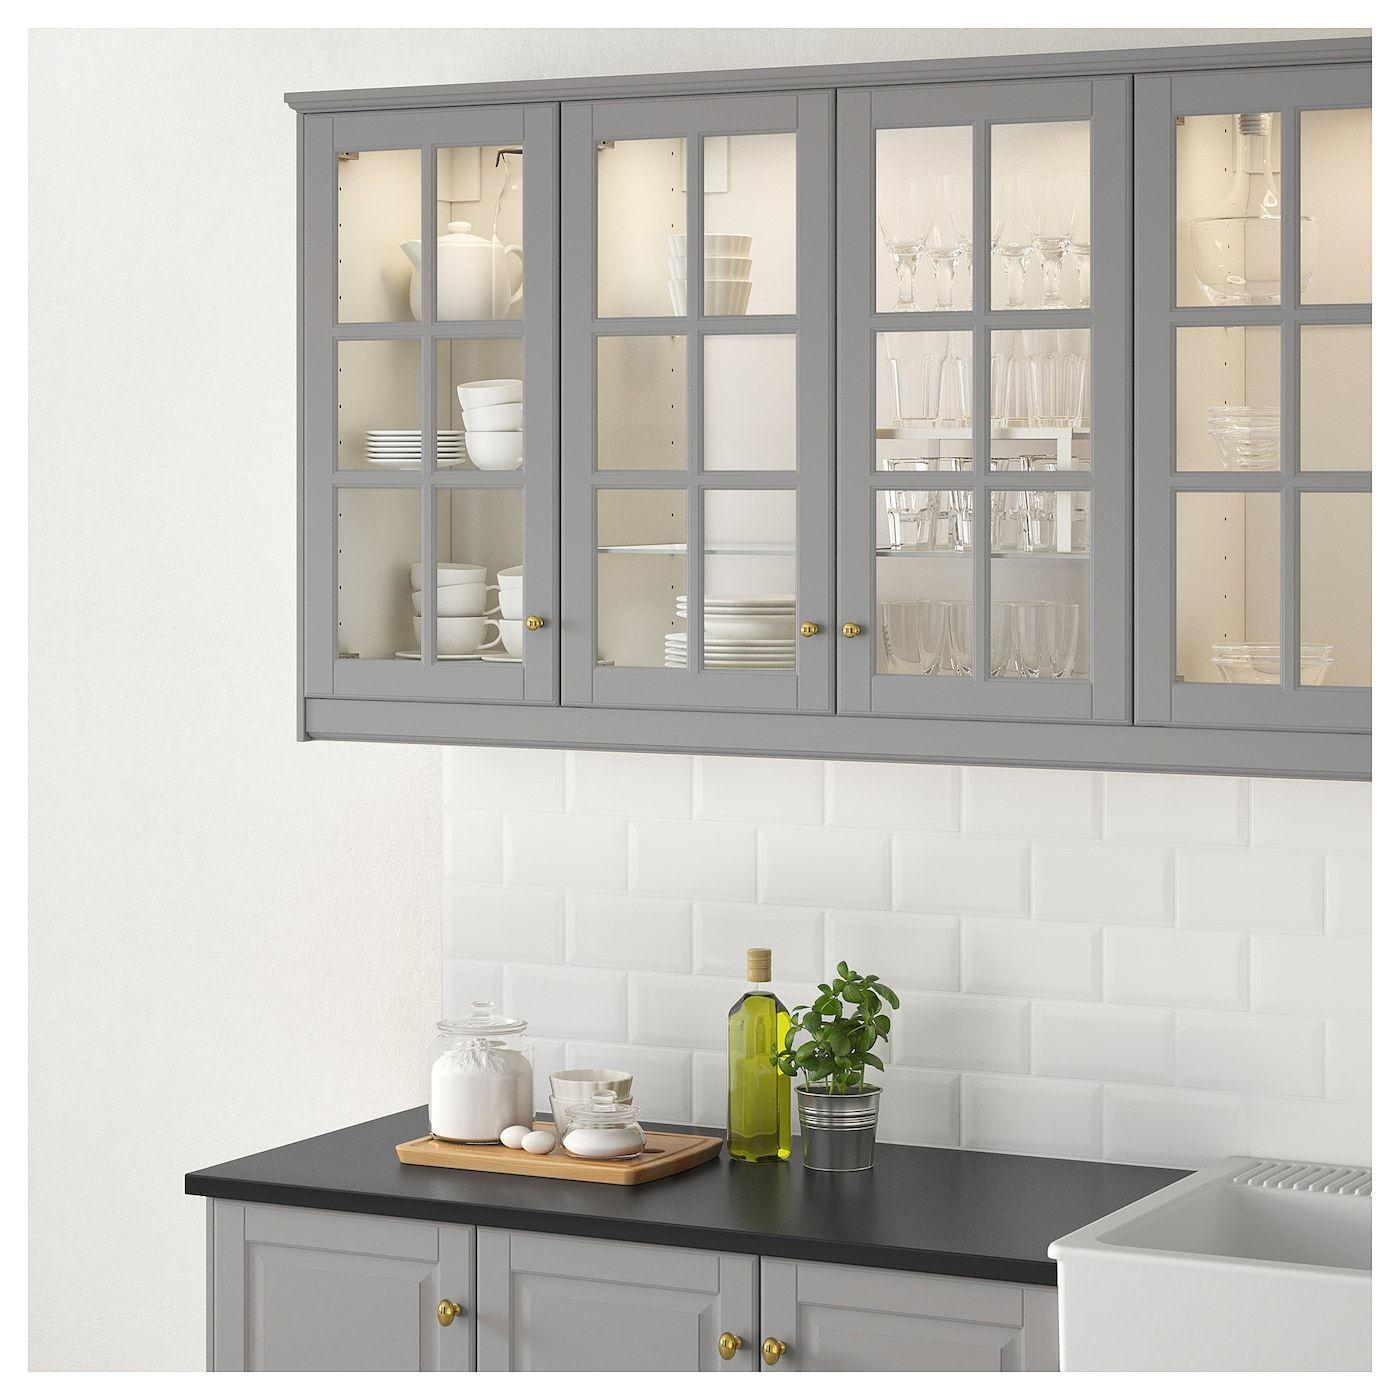 Best Ikea Bodbyn Gray Glass Door In 2020 Kitchen Design New 400 x 300